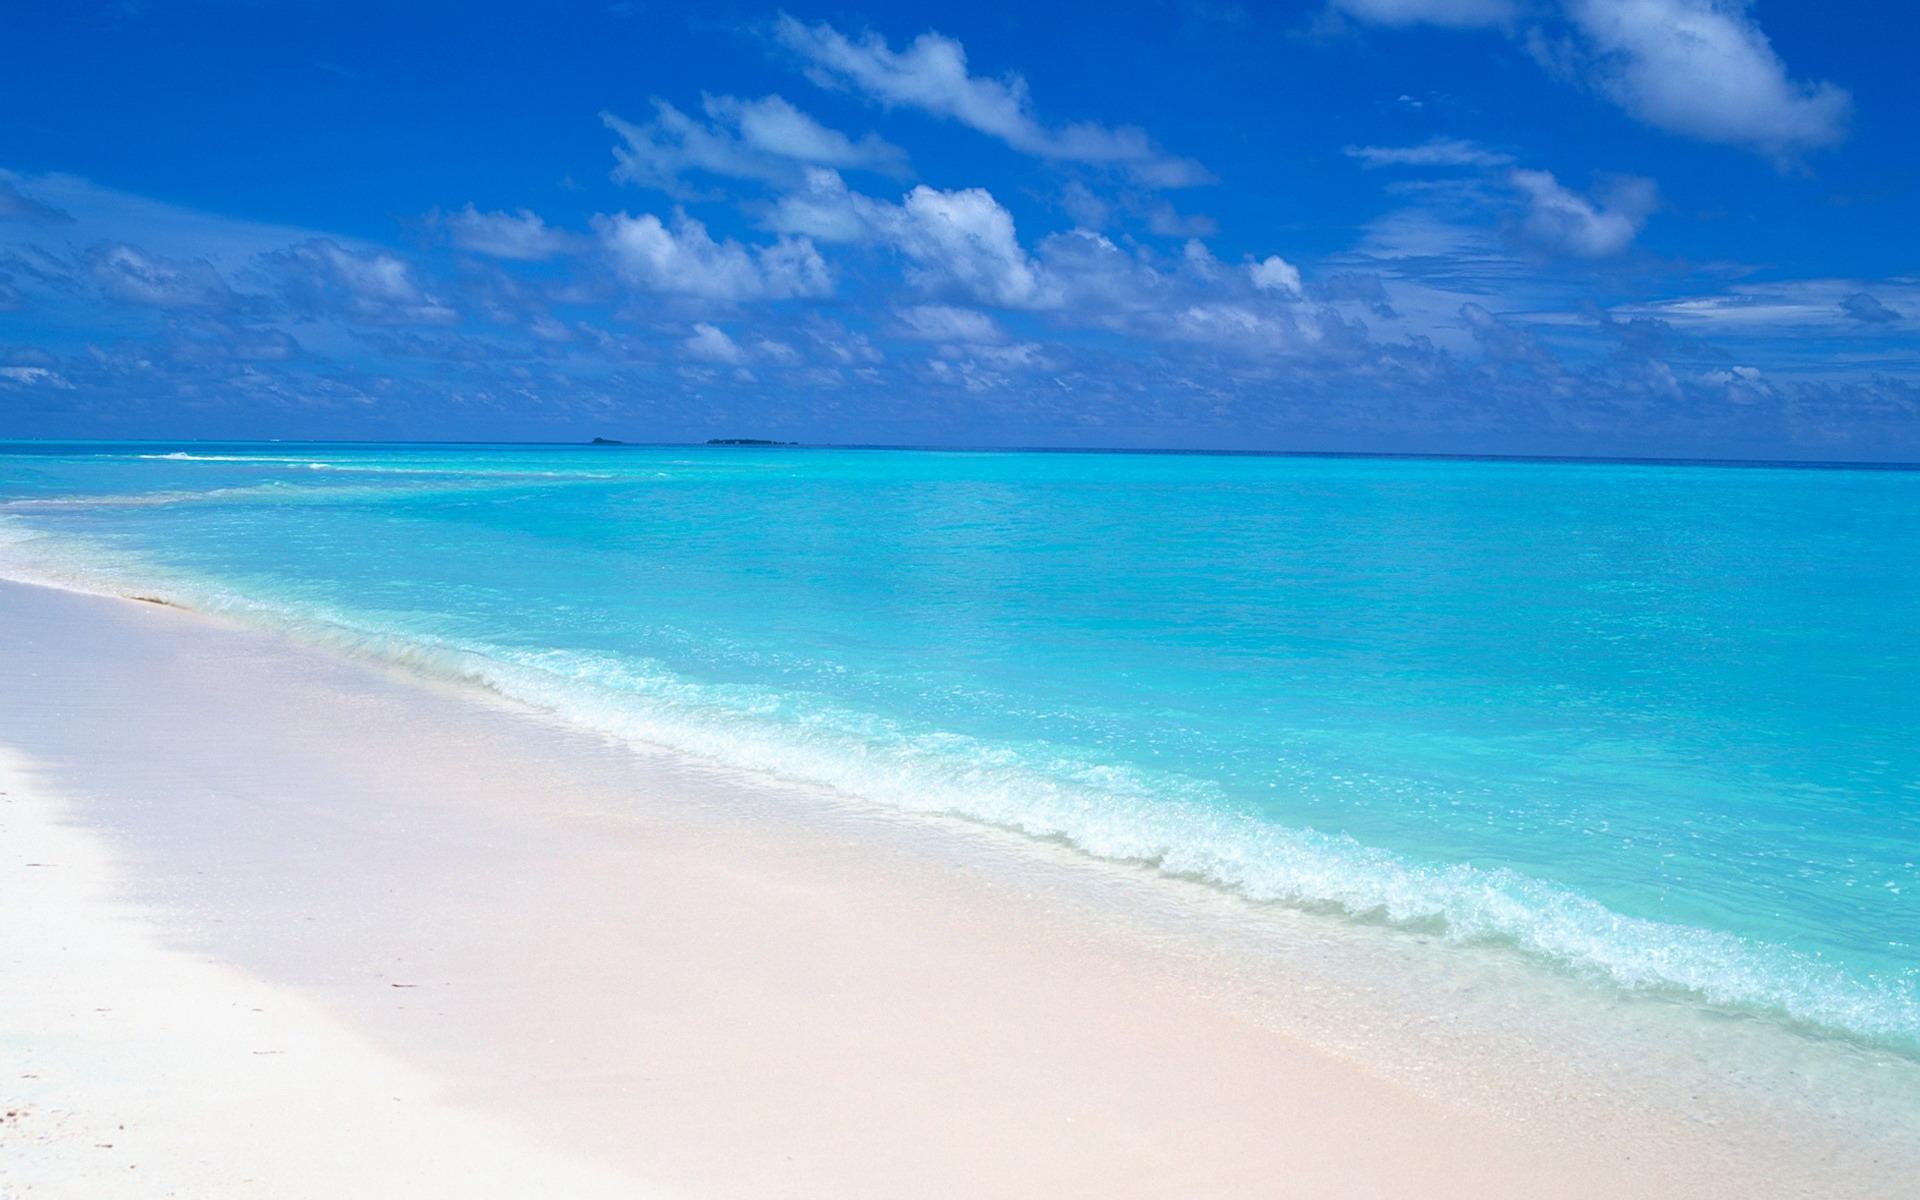 Custom 3d Photo Wallpaper Hd Maldives Sea Beach Natural: Maldives White Beach Wallpaper-1920x1200 Download